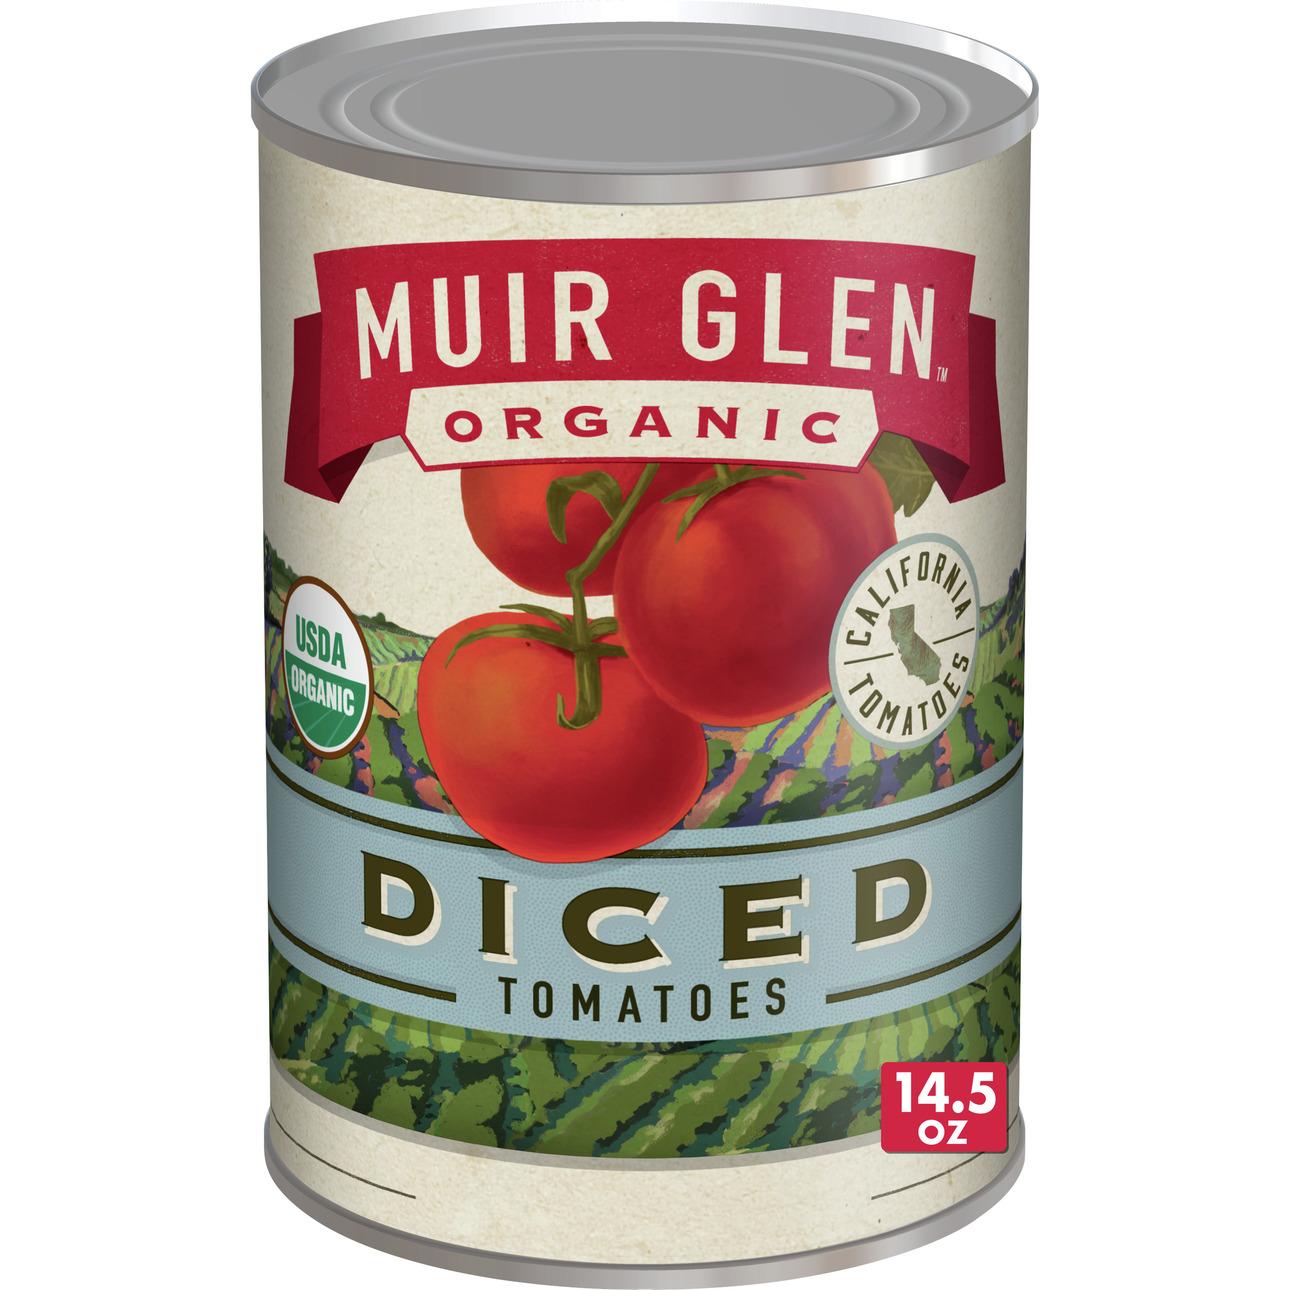 Muir Glen Diced Tomato (12x145 Oz)